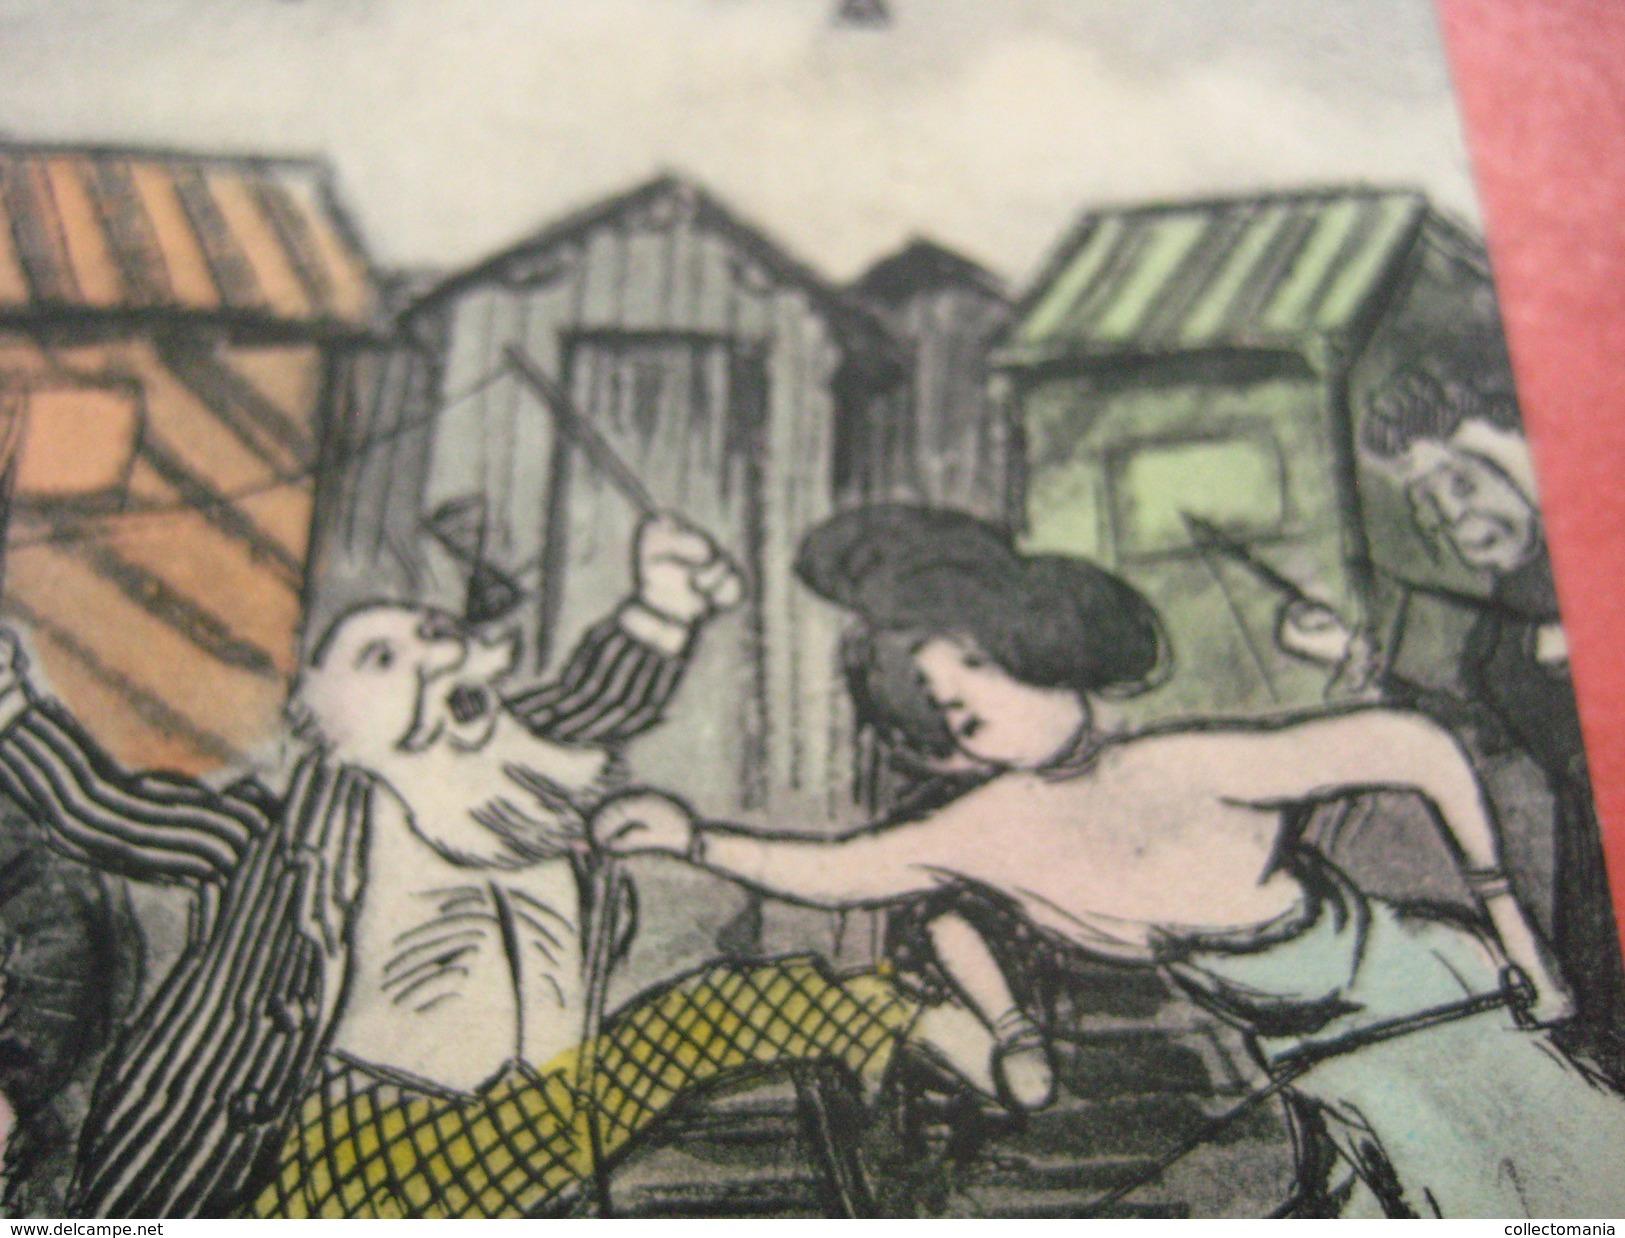 1 Postcard DIABLO - Le Fureur Diabolique - La Vie BALNEAIRE - The DIABLO Sport Around 1905 A Real Hype - Blankenberge - Blankenberge